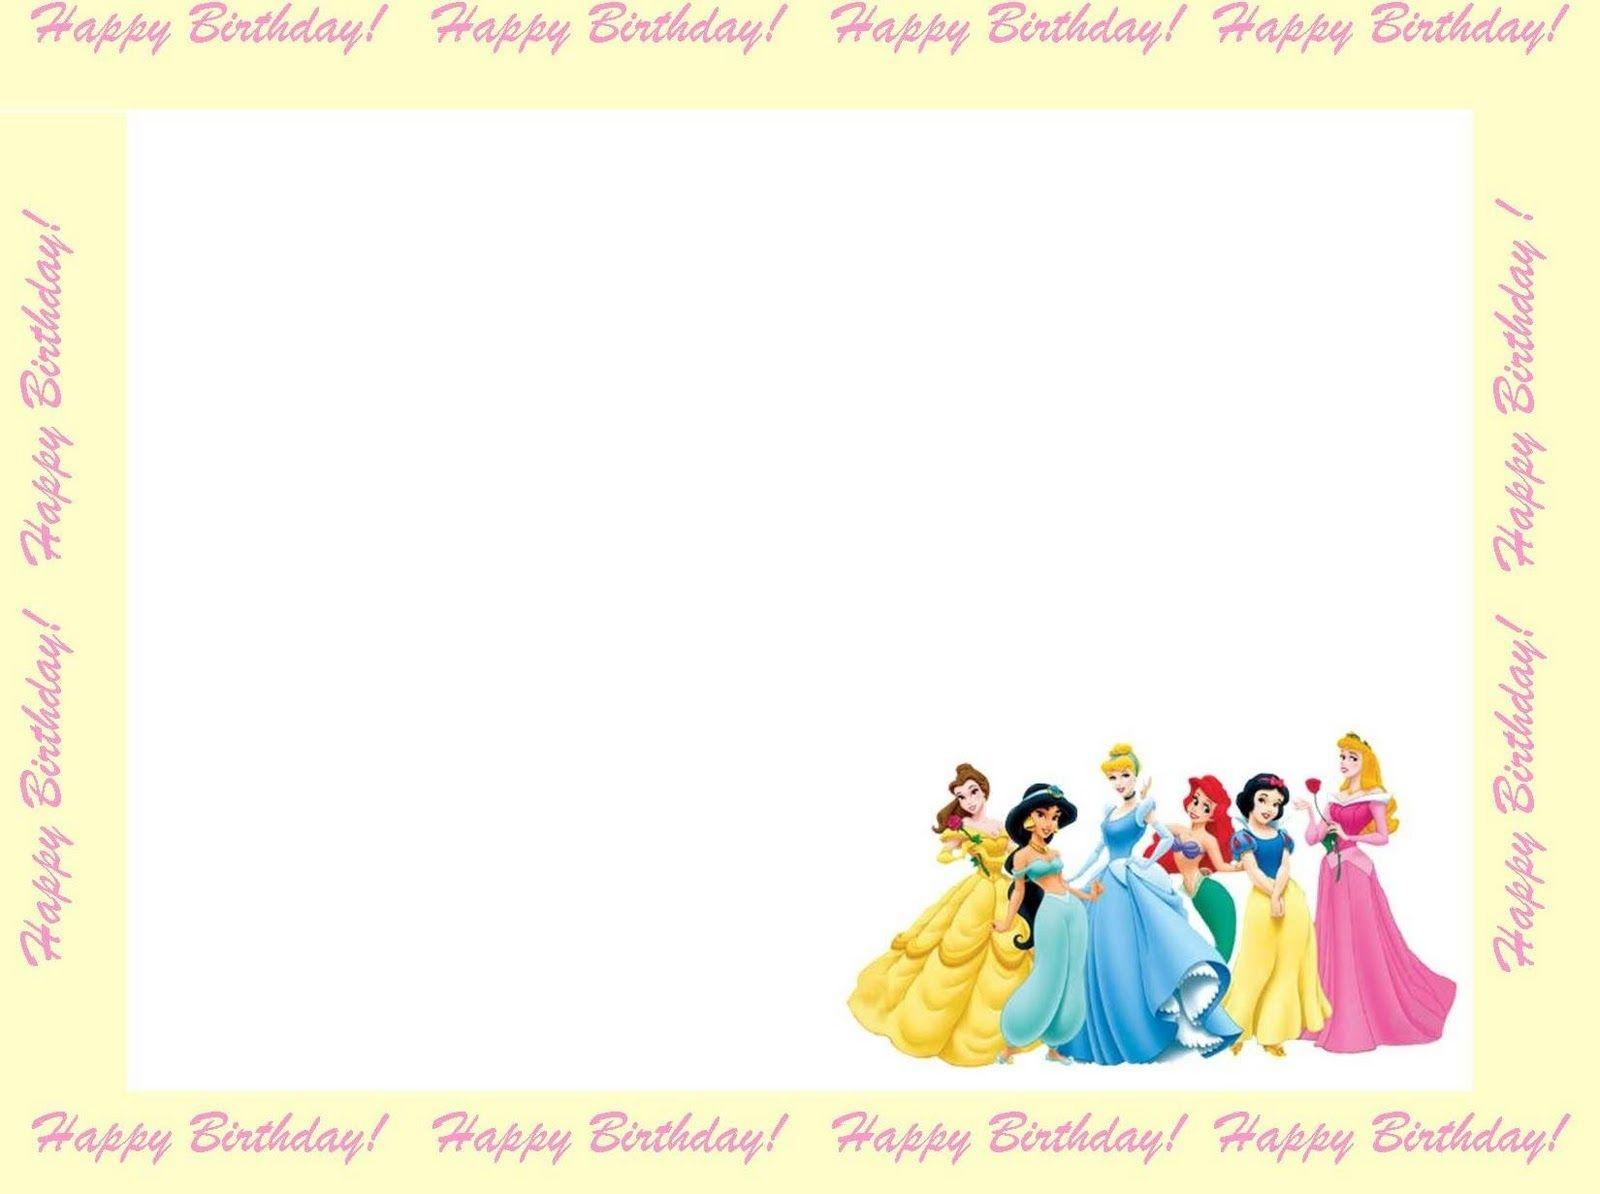 Free Princess Invitations To Print | Free Printable Disney Princess - Disney Princess Free Printable Invitations